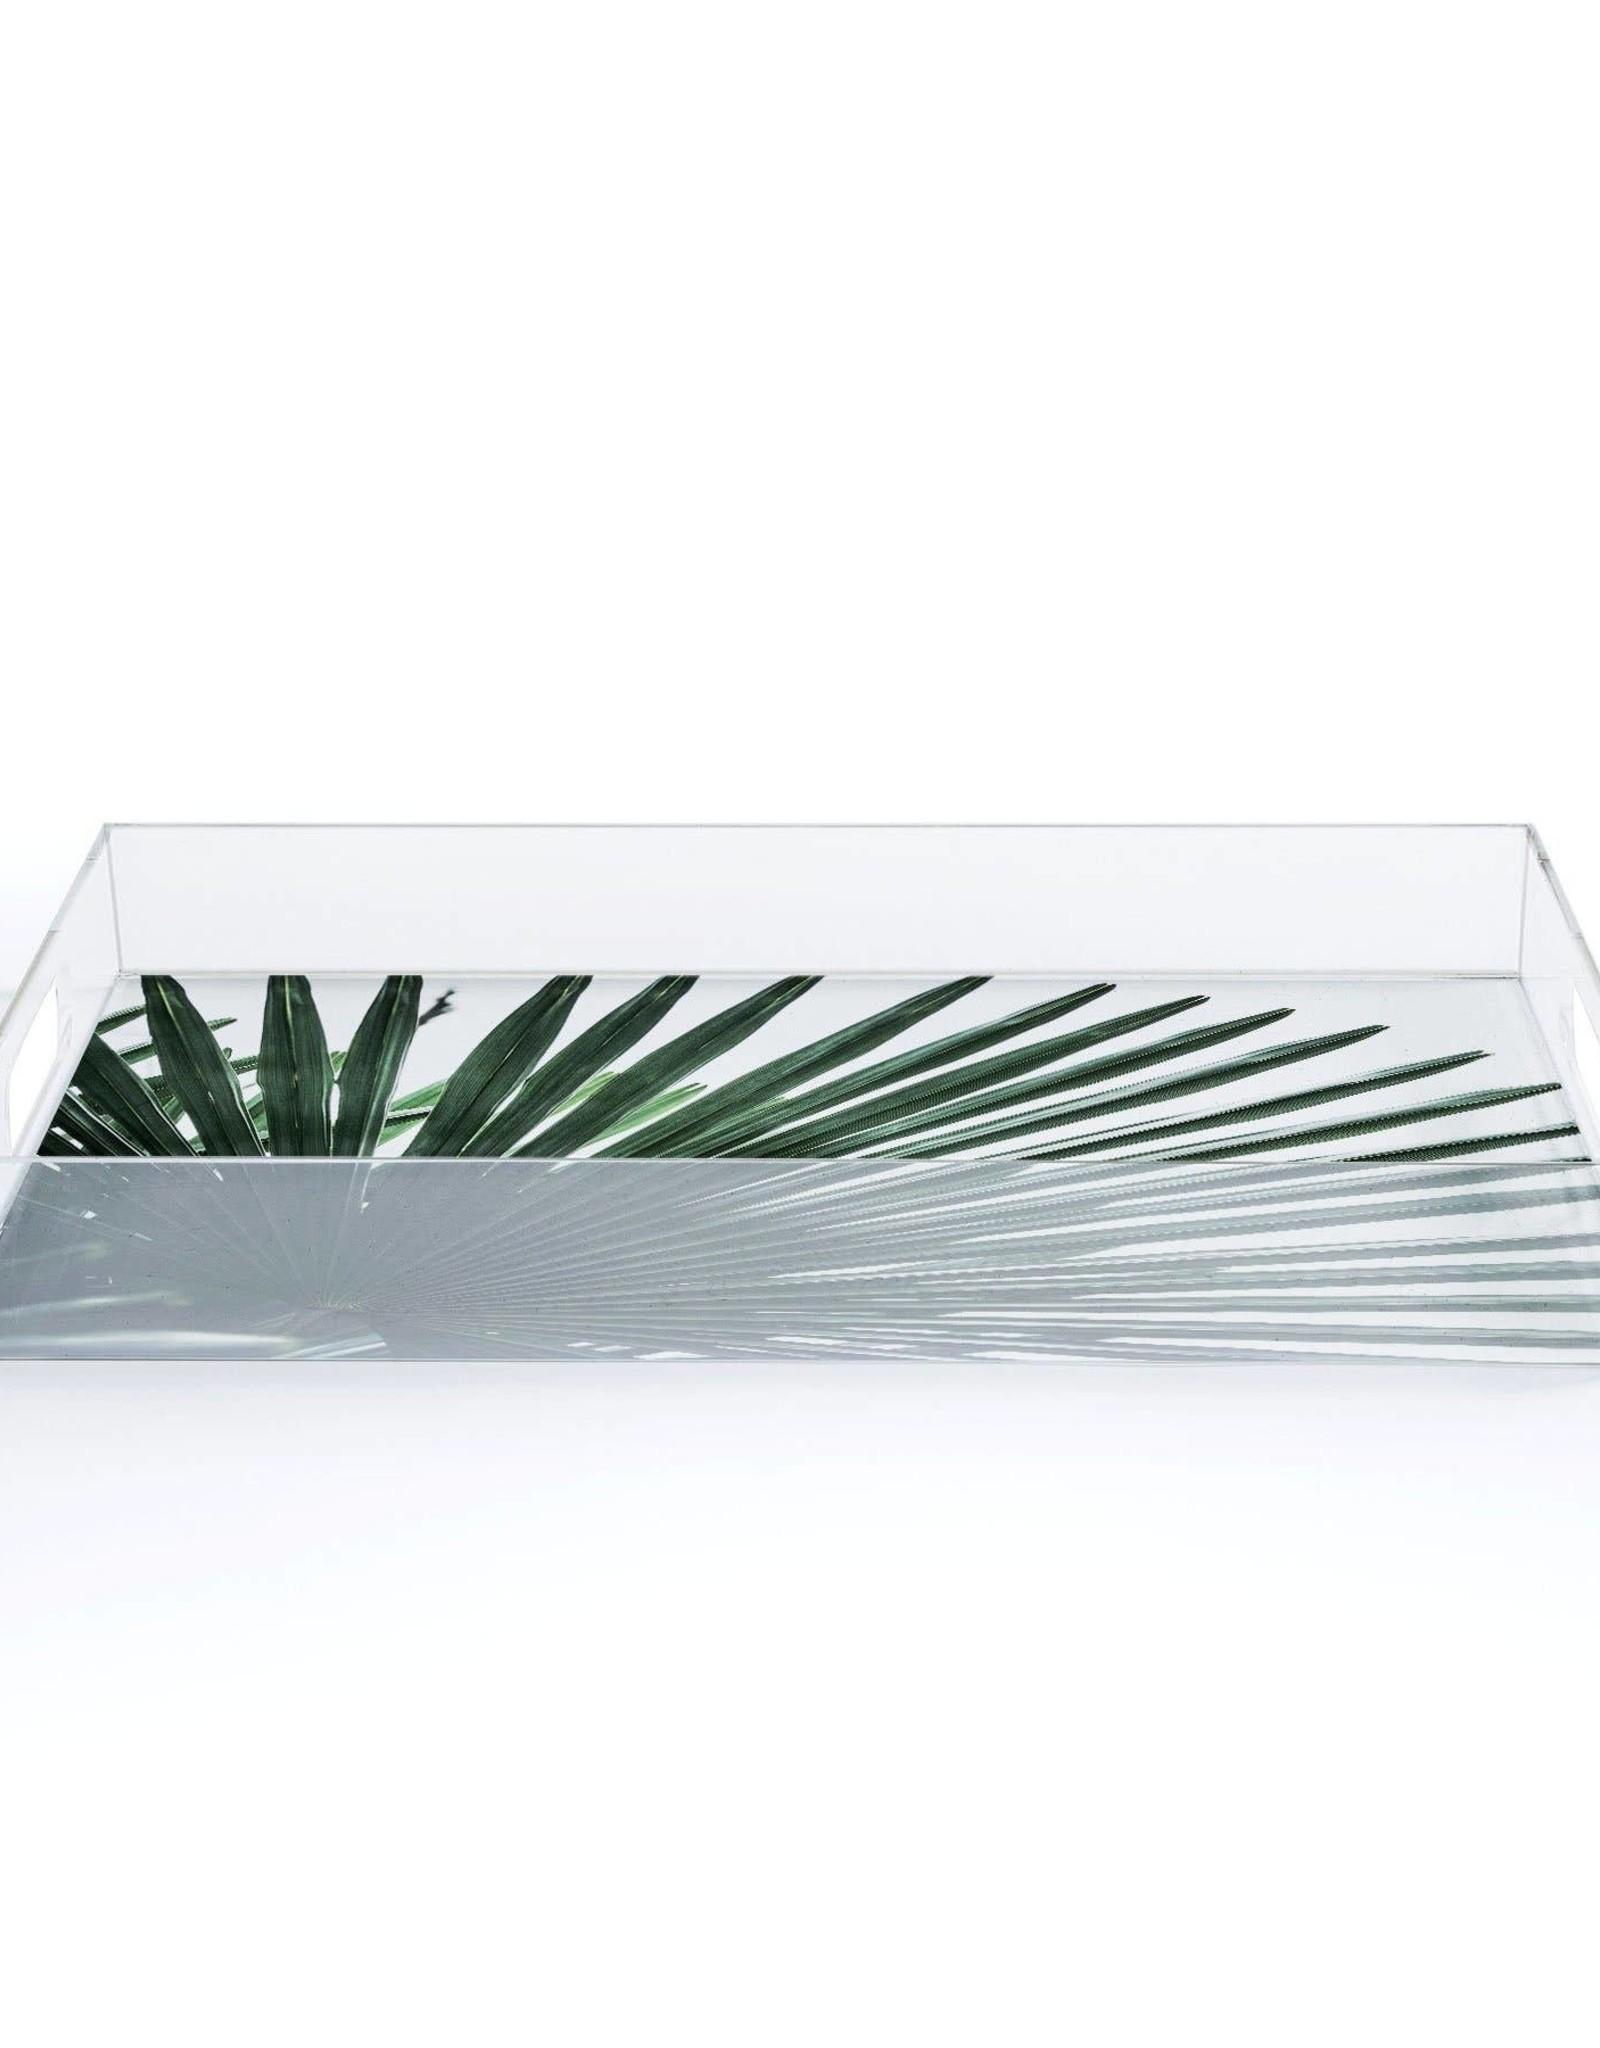 Deny Designs Tray - Small Acrylic: Leaves